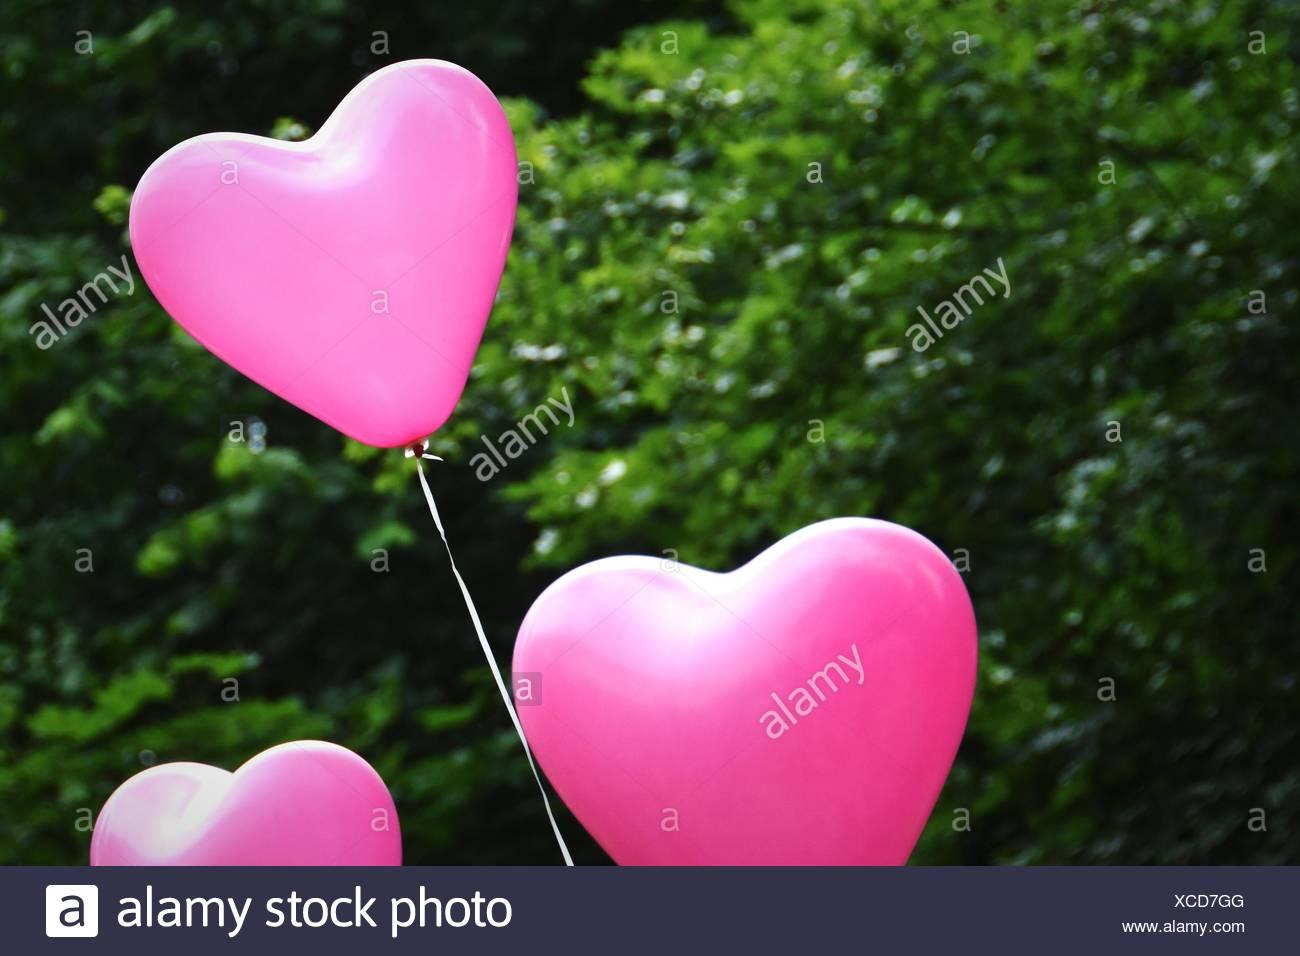 Luftballons in Herzform Stockfoto